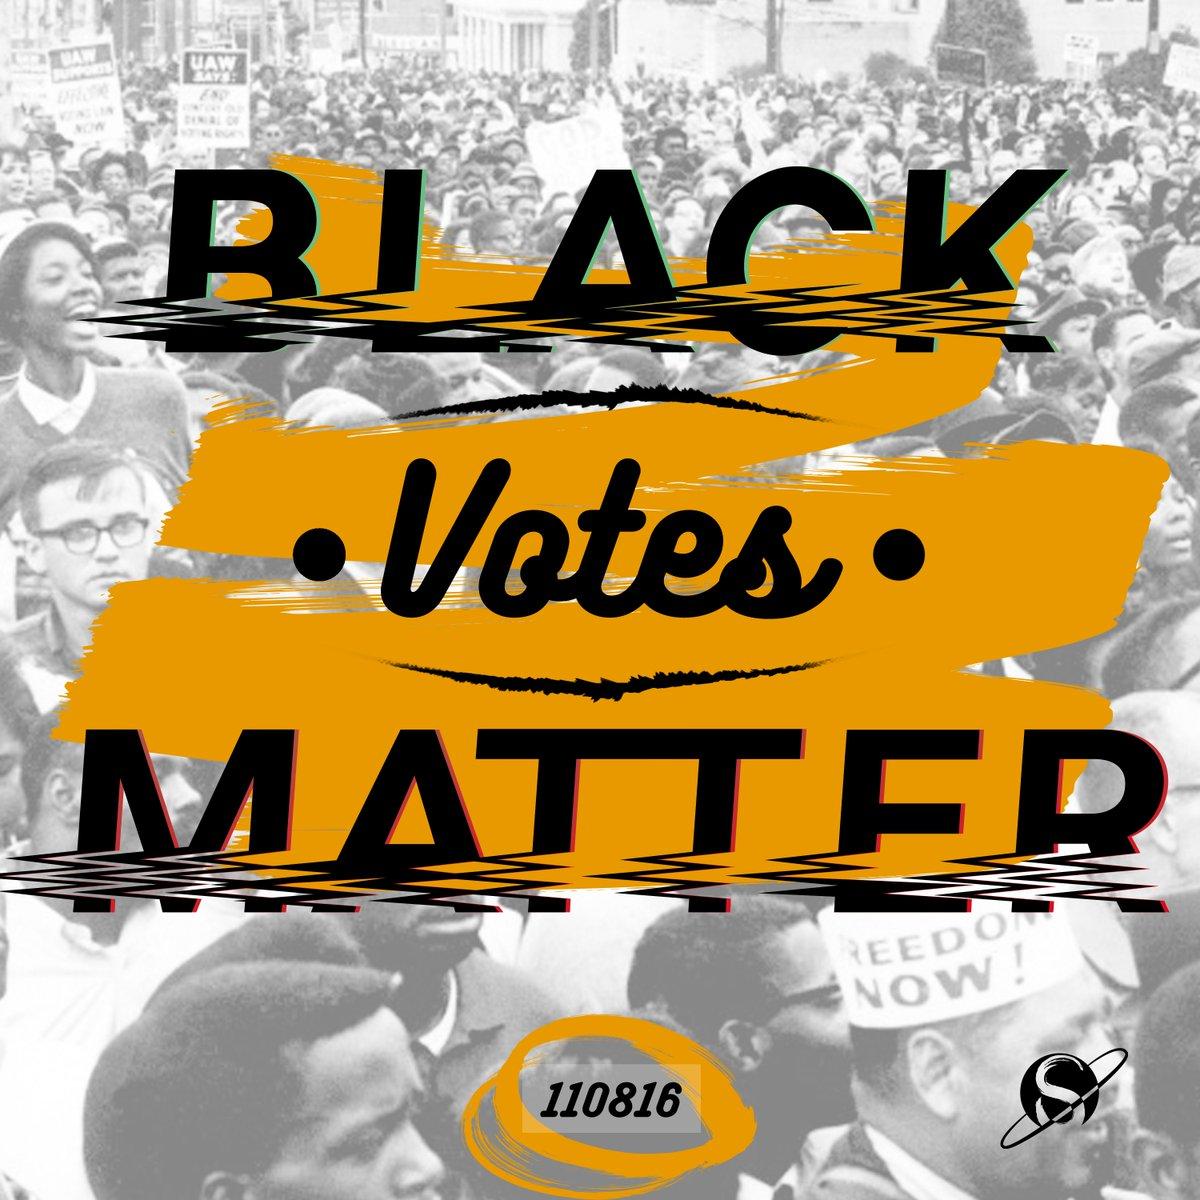 #BlackVotesMatter artwork by me #studiooutlandish https://t.co/rL6kQNGWO3